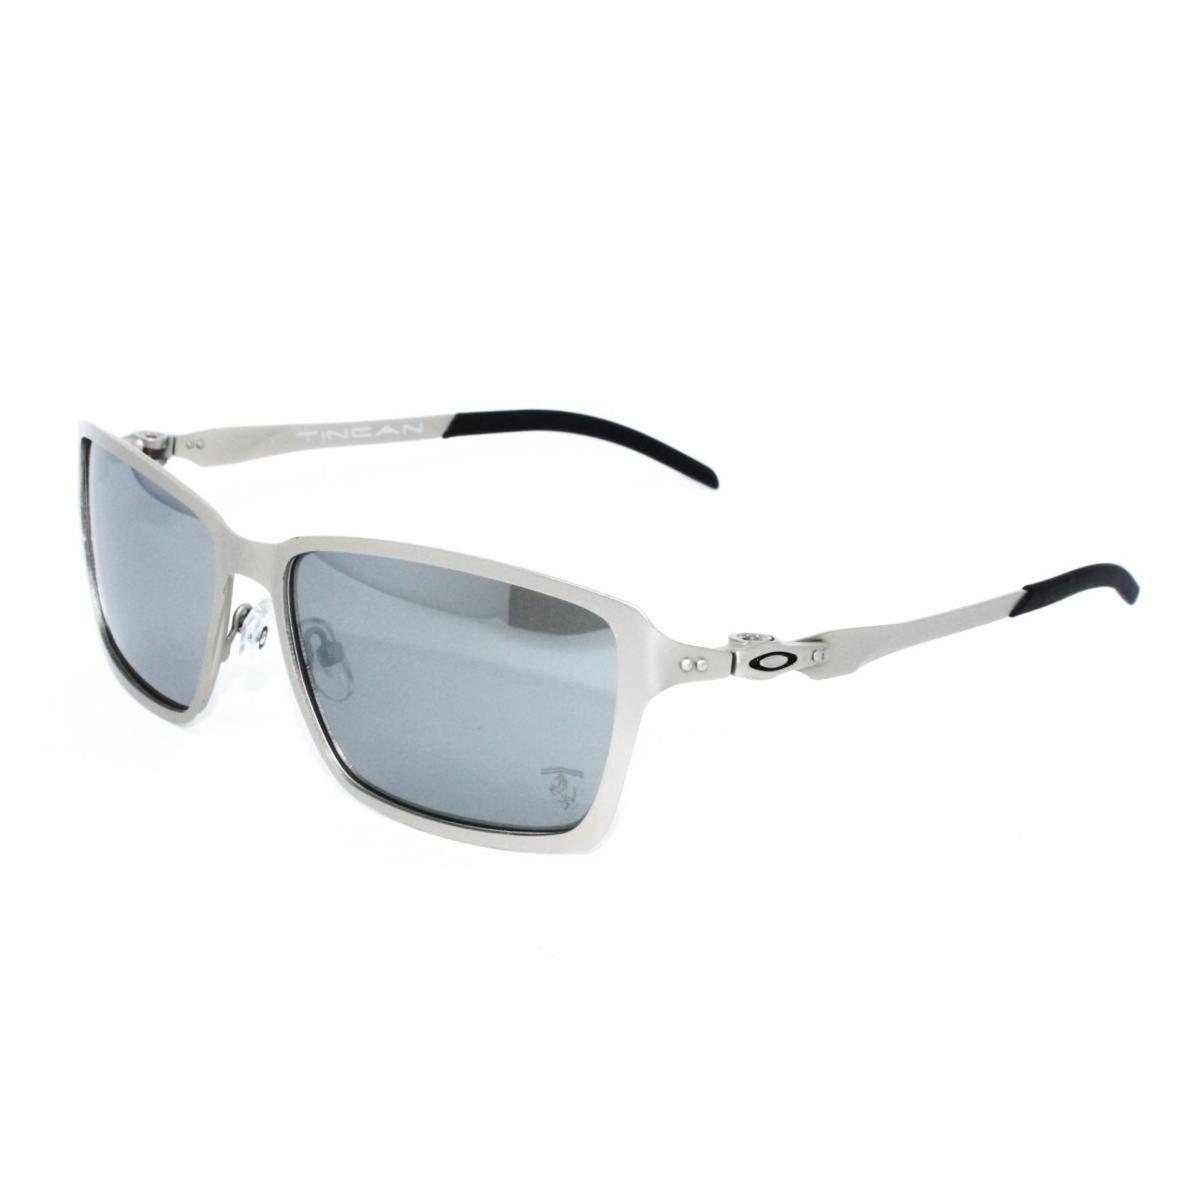 óculos oakley tincan ferrari 100% polarizado promoção!!! - óculos oakley 9b5ddaa684